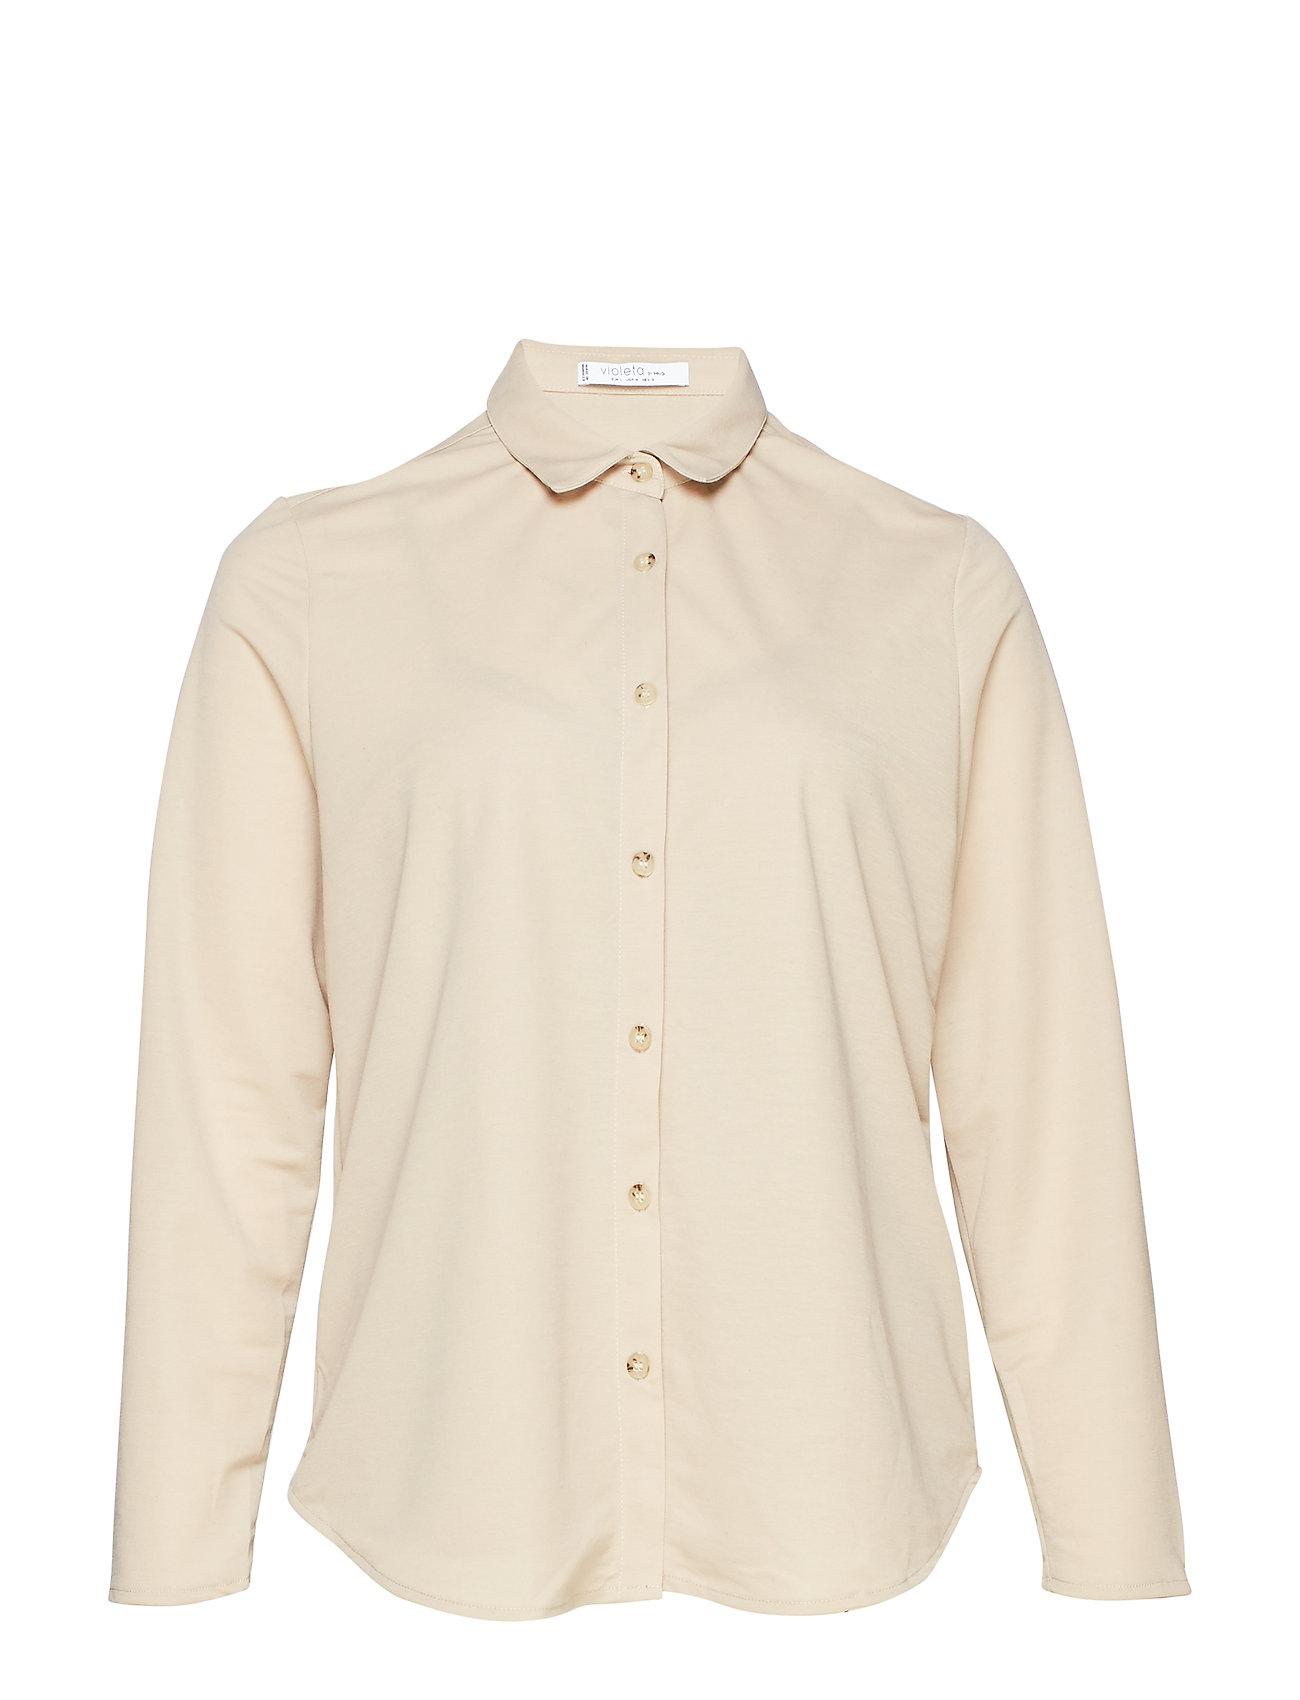 Violeta by Mango Incorporated top shirt - MEDIUM BROWN